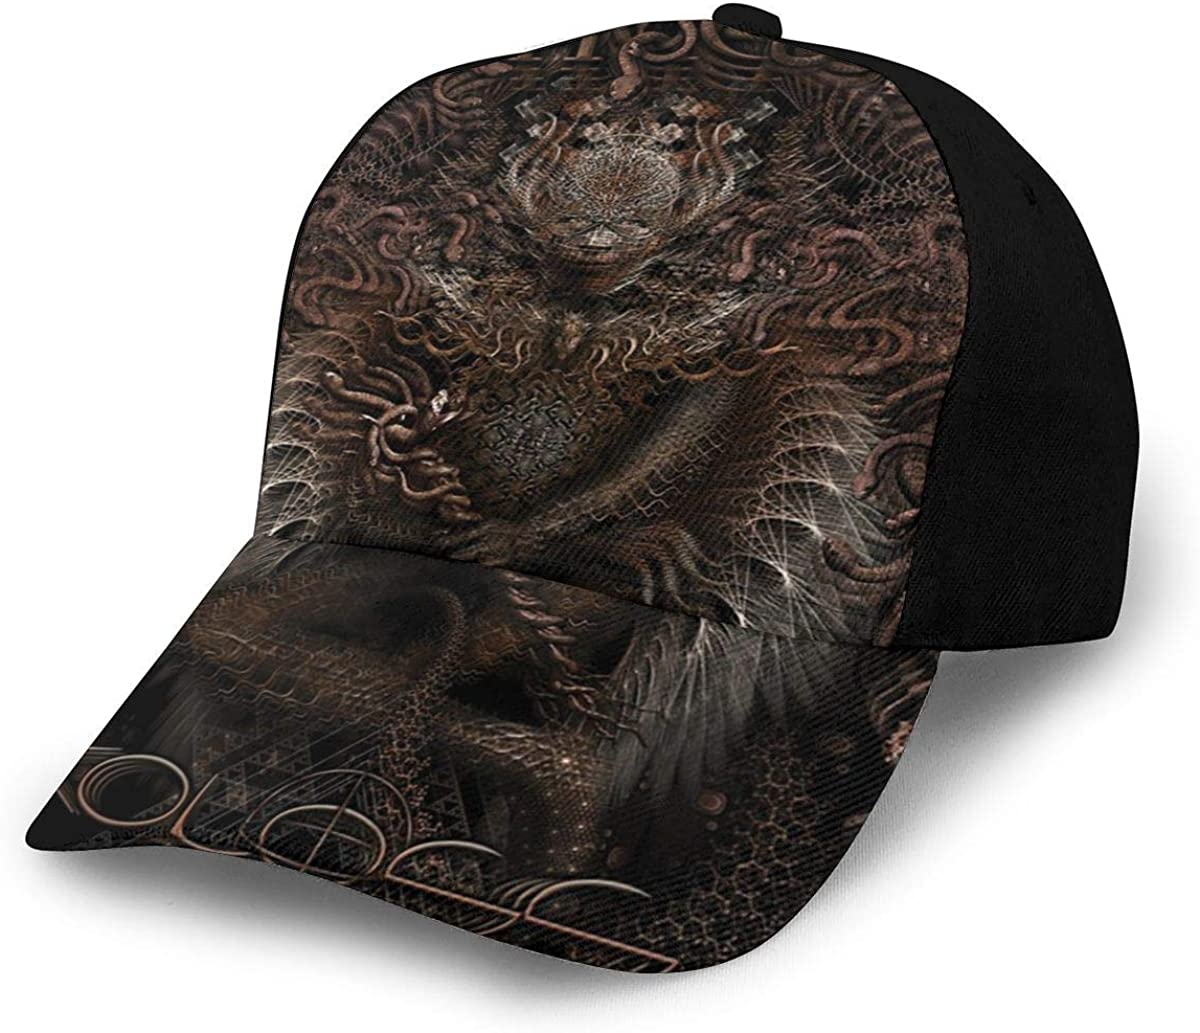 Frieda J O Meshuggah Koloss Cap Outdoor Unisex Hat Adjustable Athletic Hat Trucker Hat